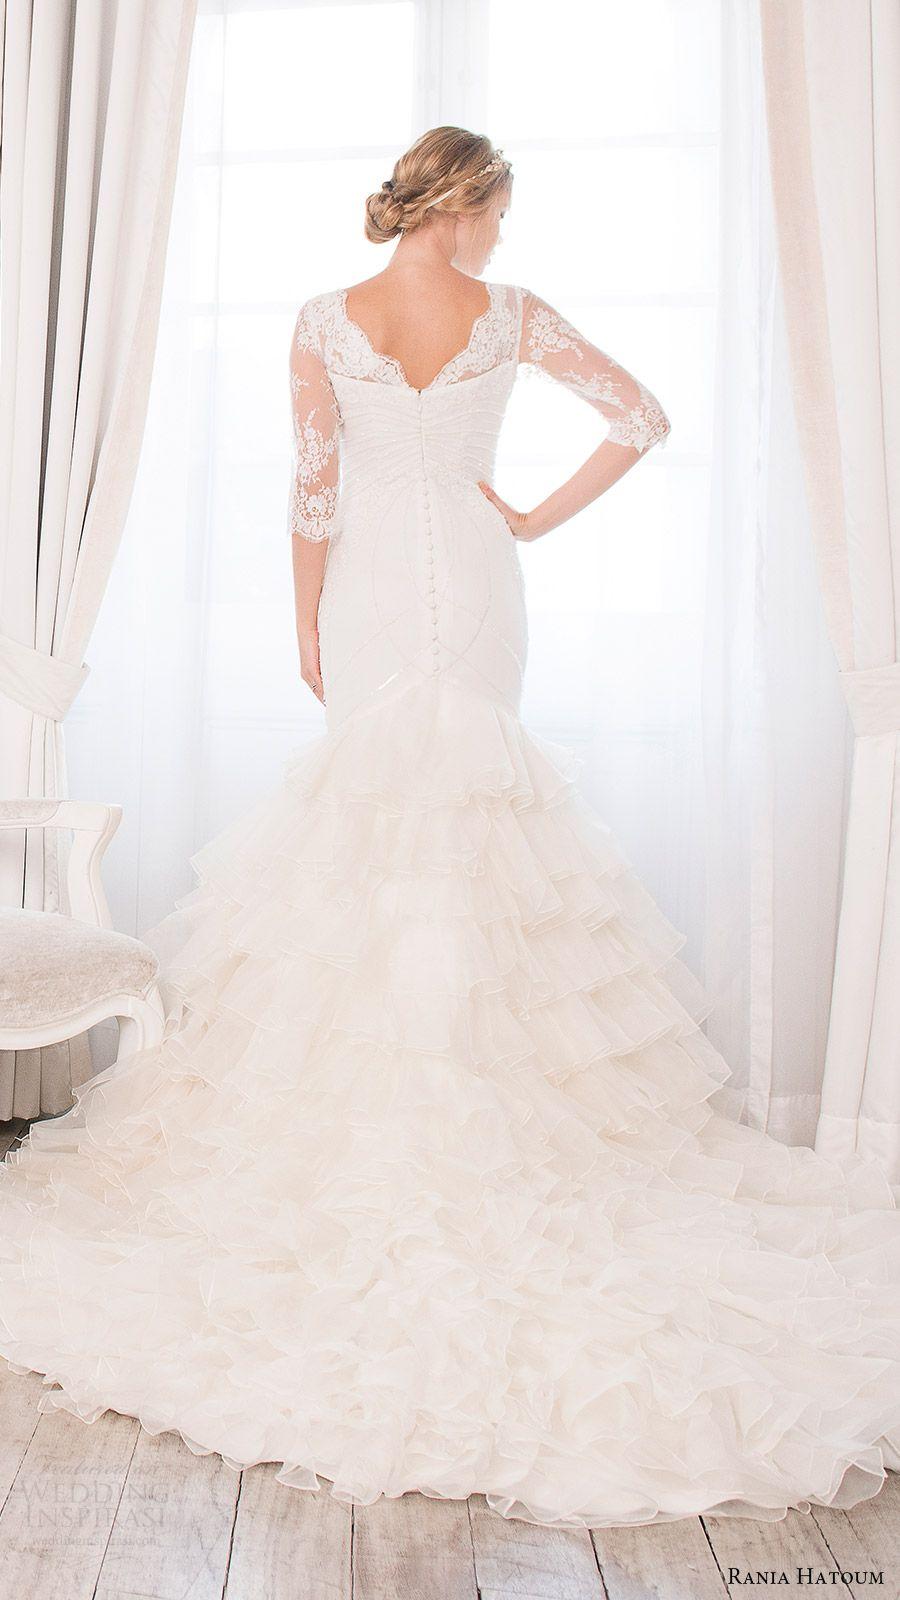 Lace sleeve mermaid wedding dress  Rania Hatoum Spring  Wedding Dresses  Mermaid wedding dresses